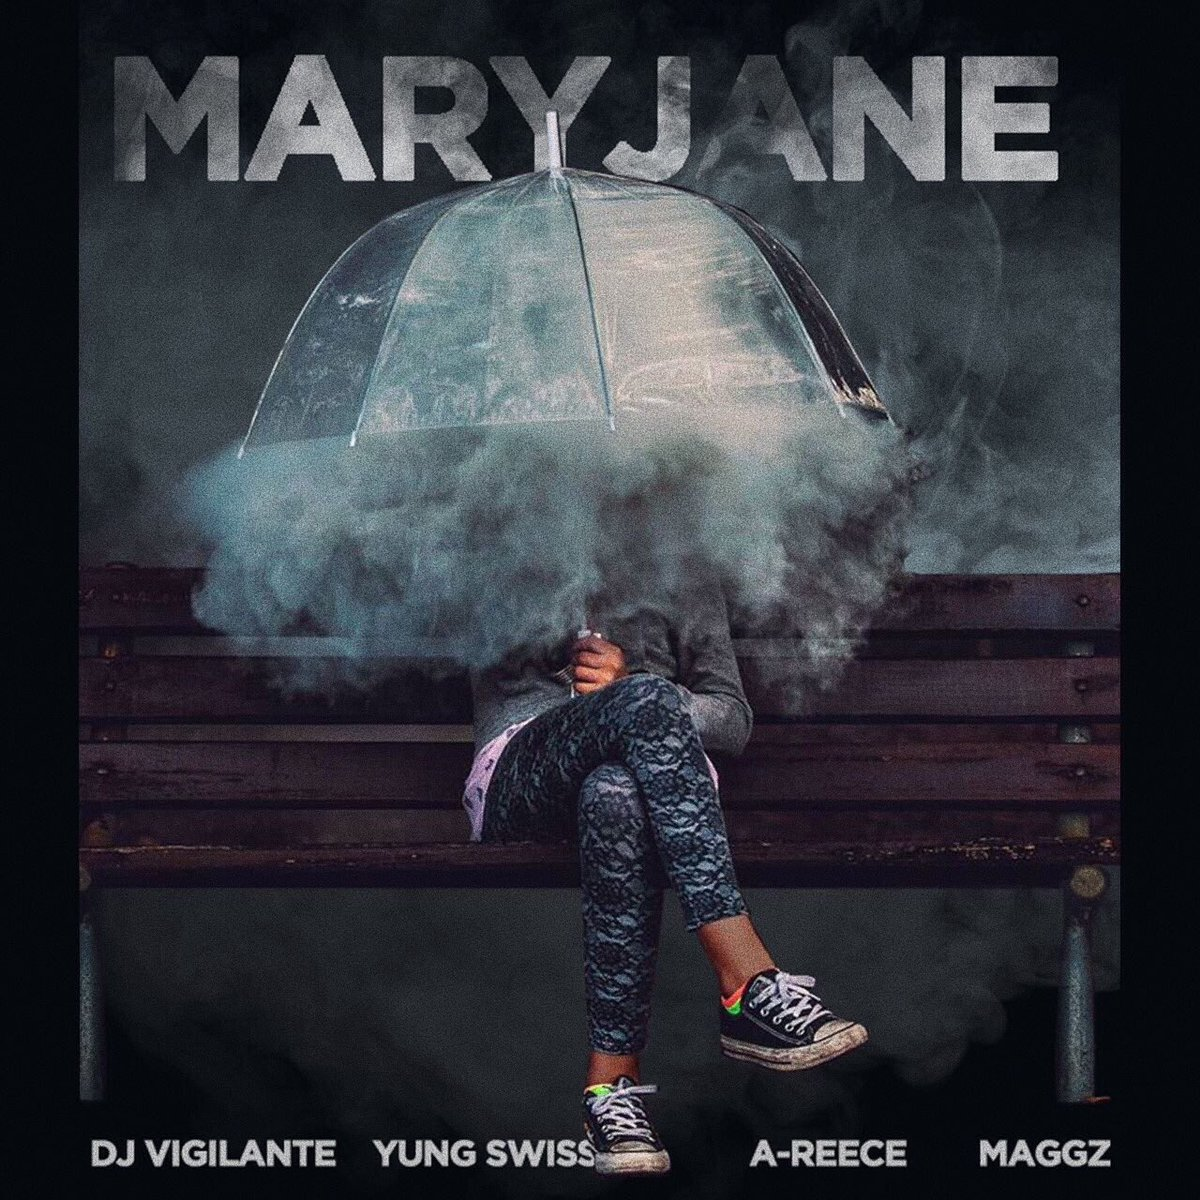 Lyrics: Dj Vigilante - Mary Jane Lyrics Ft Yung Swiss, A-Reece & Maggz